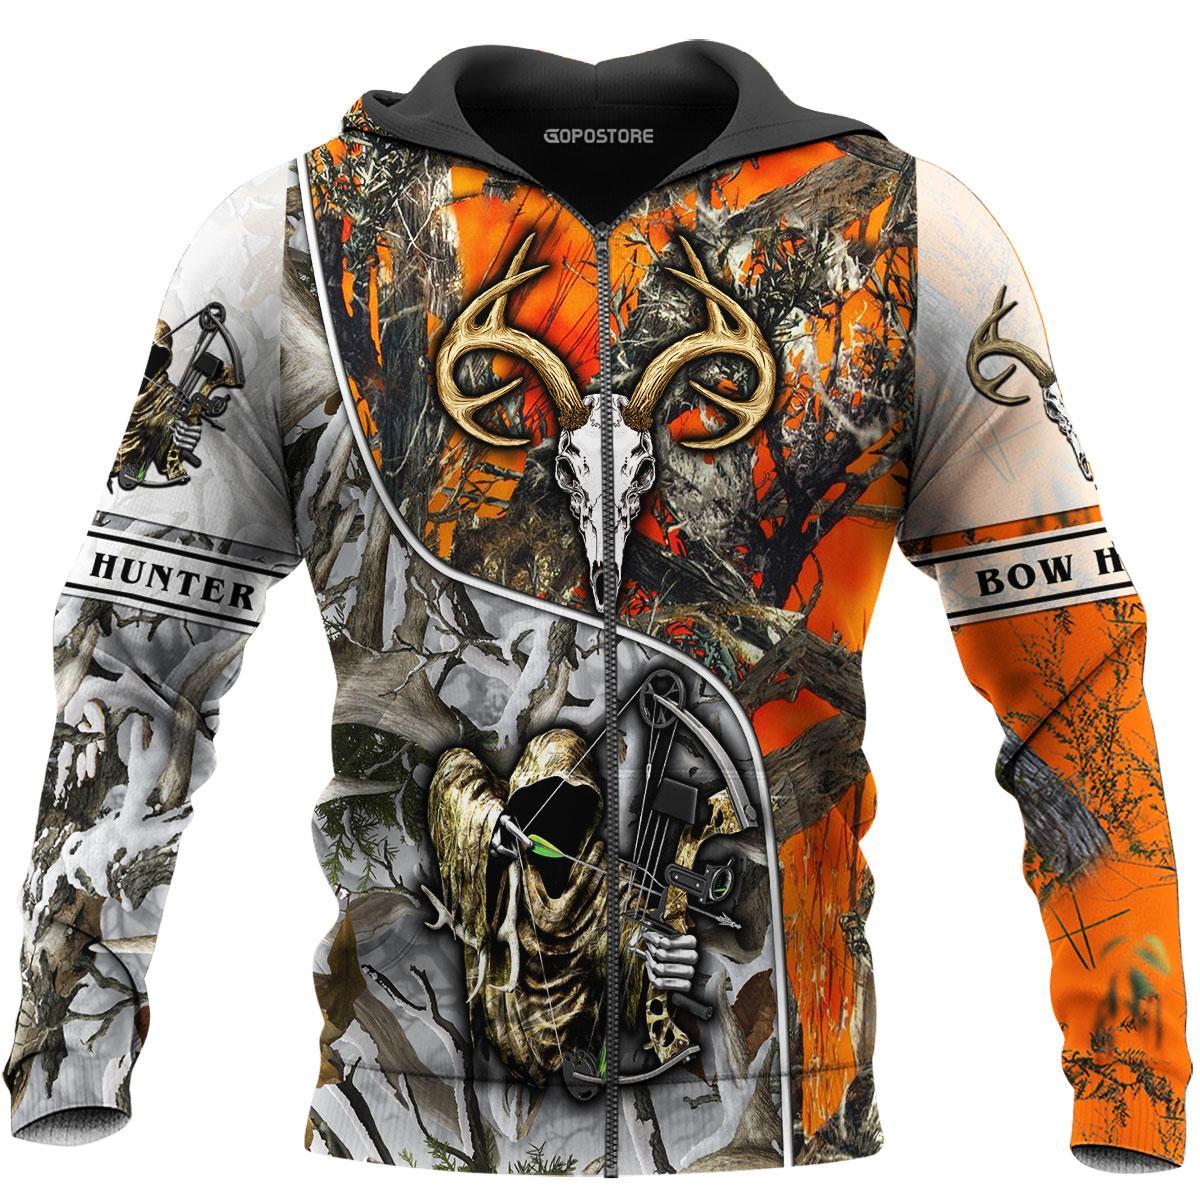 Bow Hunter 3d zip hoodie